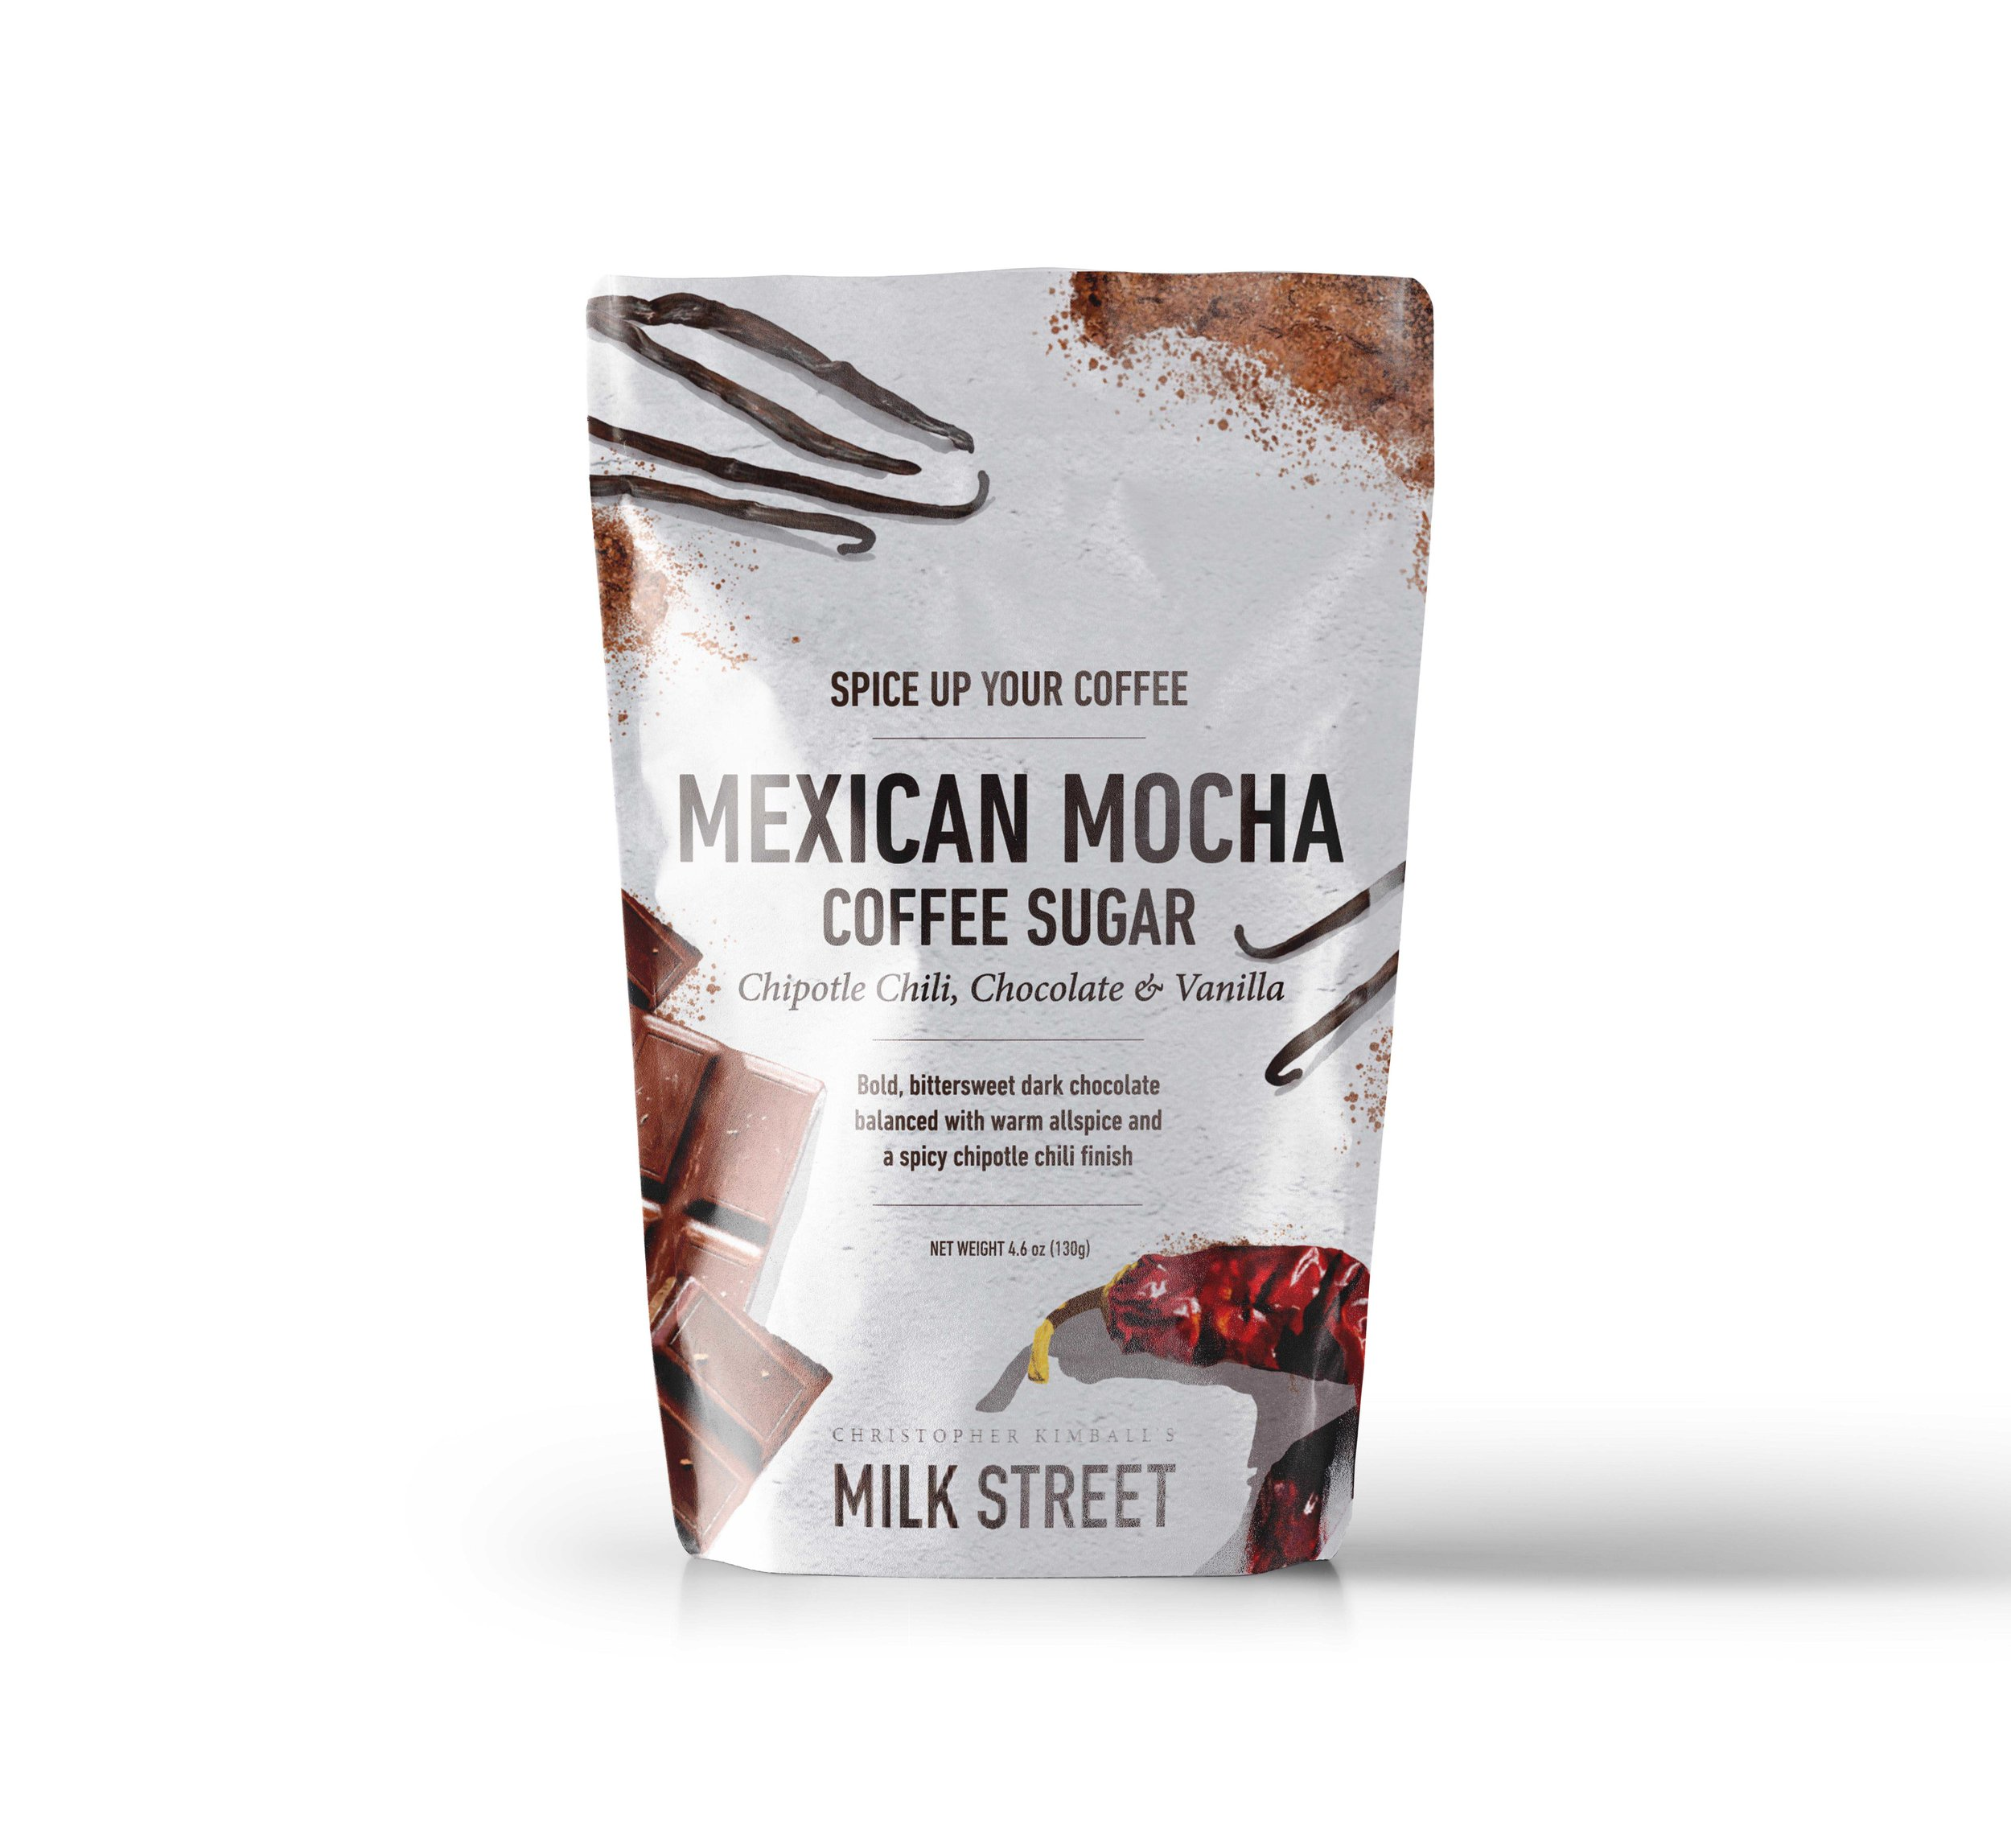 MexicanMocha_Front.jpg